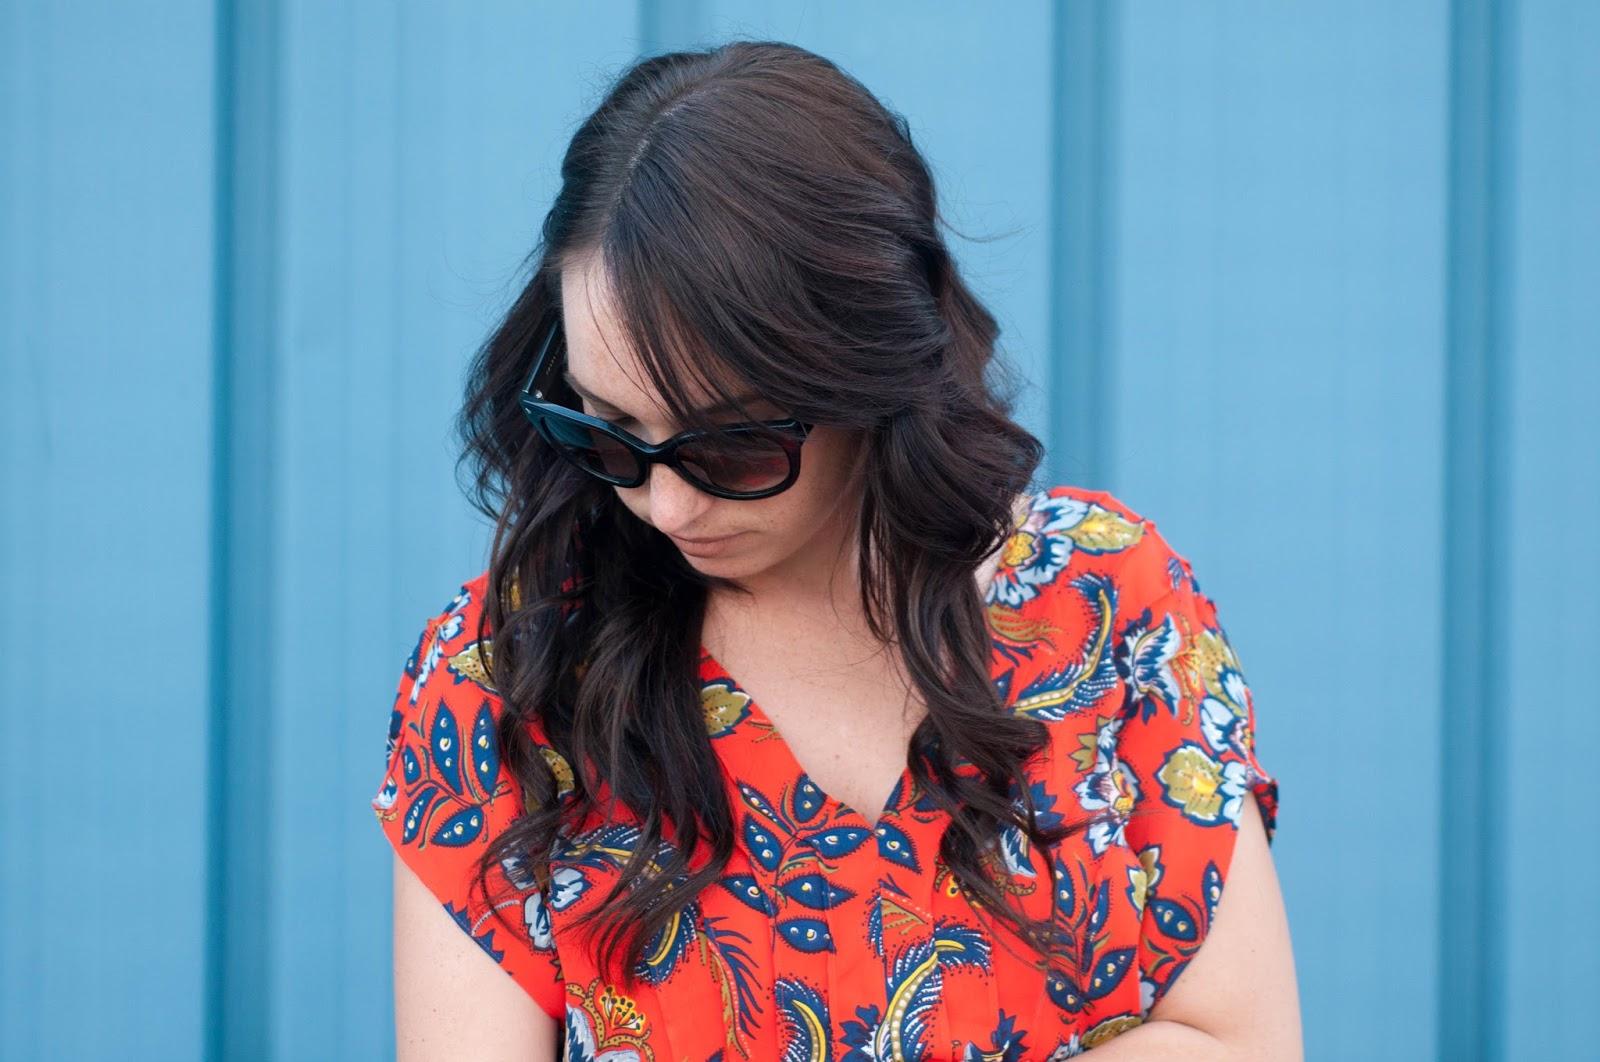 curly hair, paisley print, ootd, prada cat eye sunglasses, prada sunglasses, lands end dress